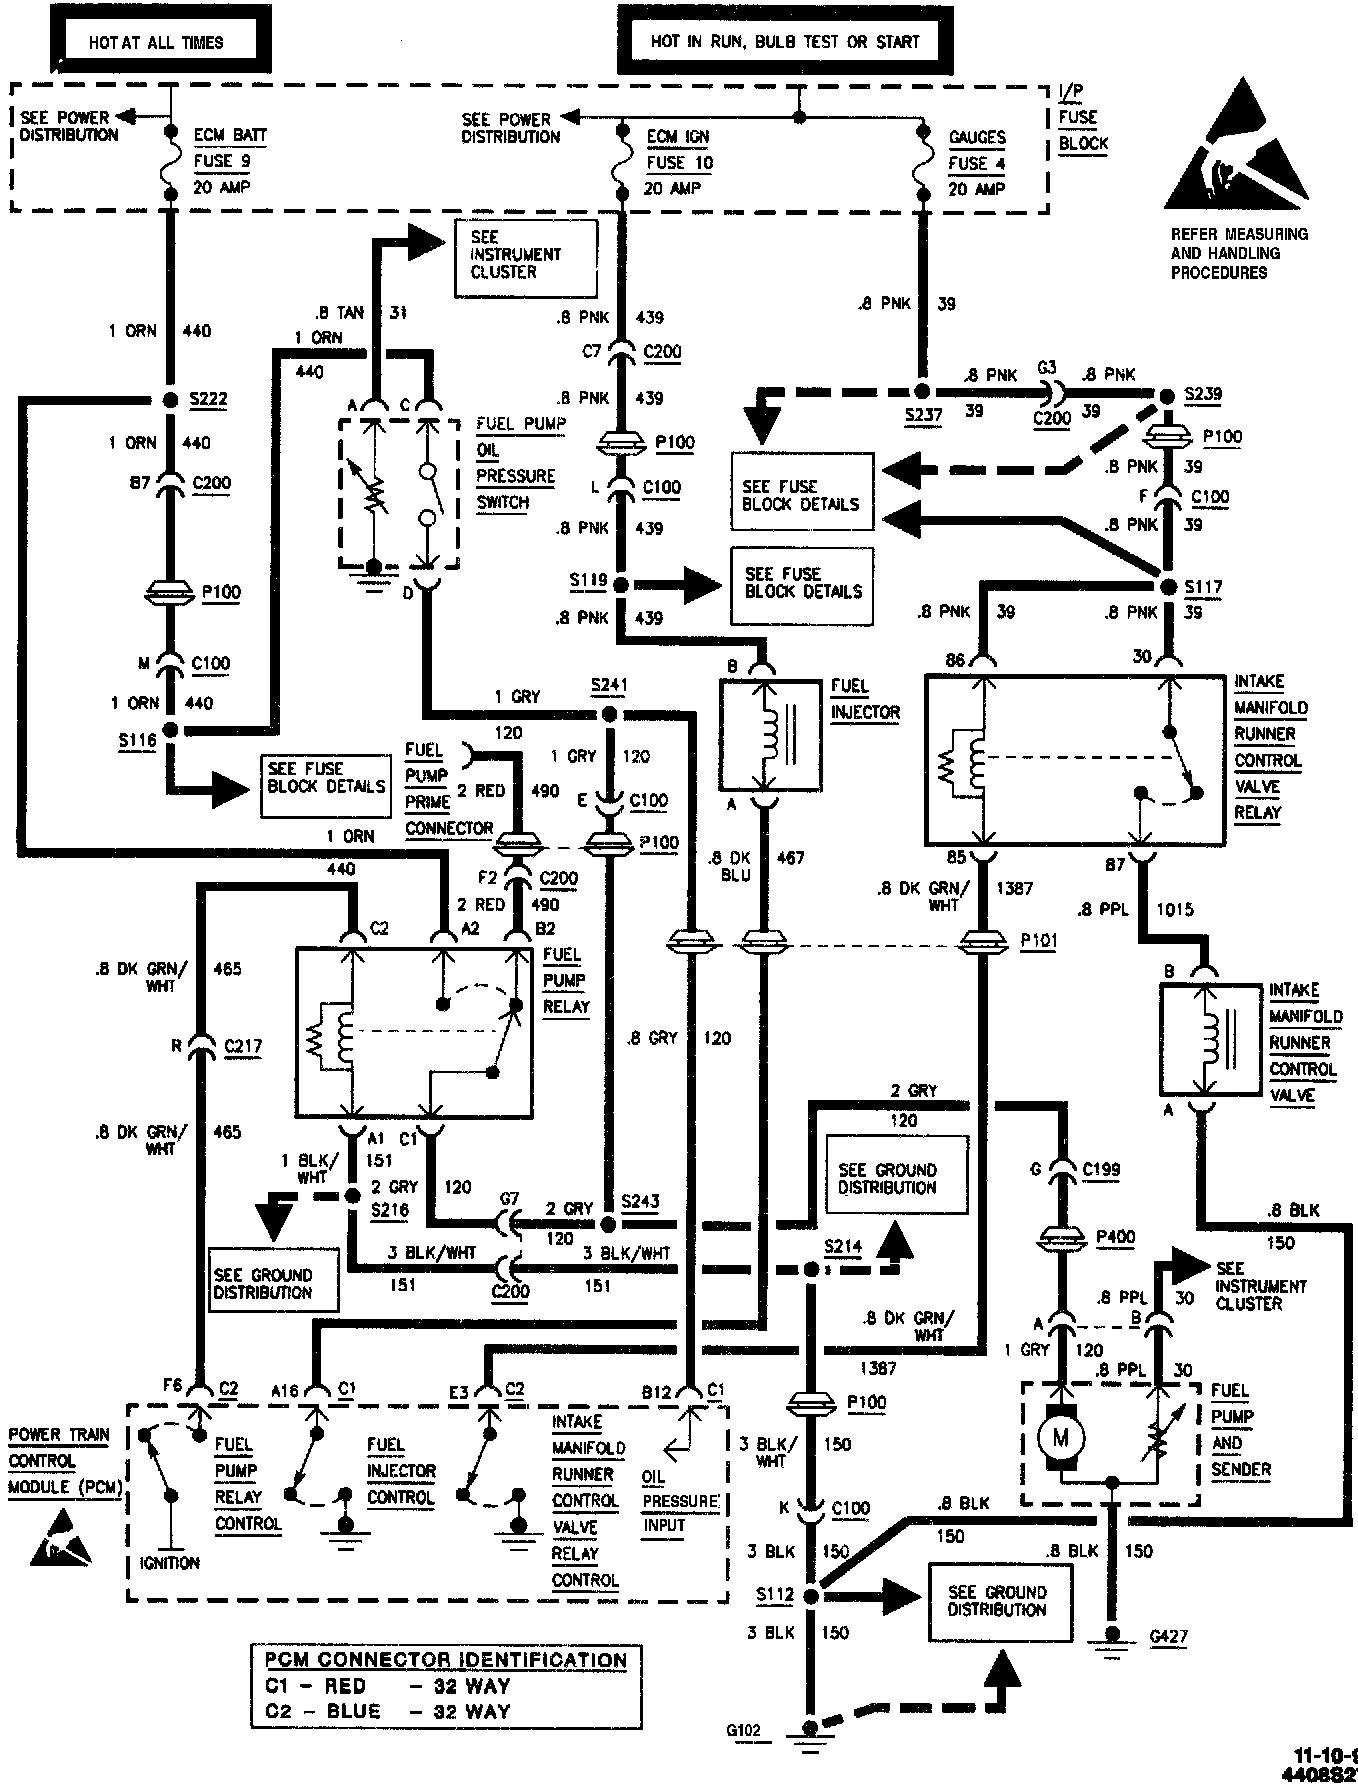 1995 Chevy 4x4 Wiring Diagram